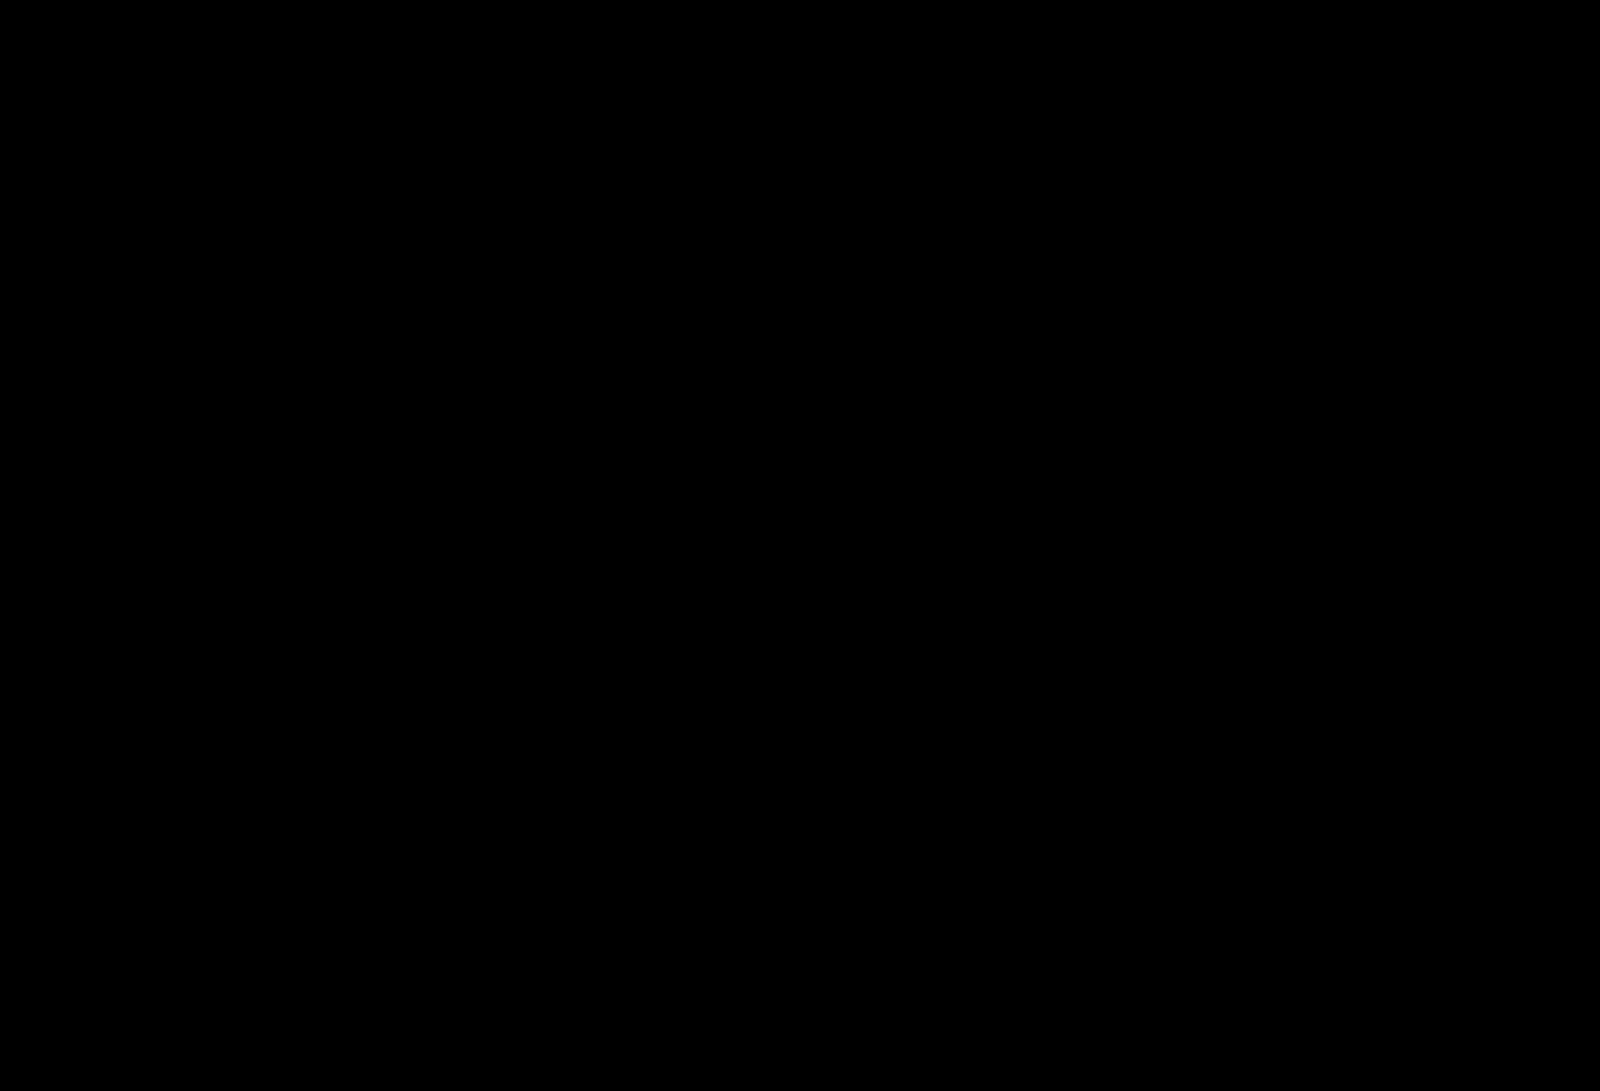 dimensional_lettering_pearl-izumi